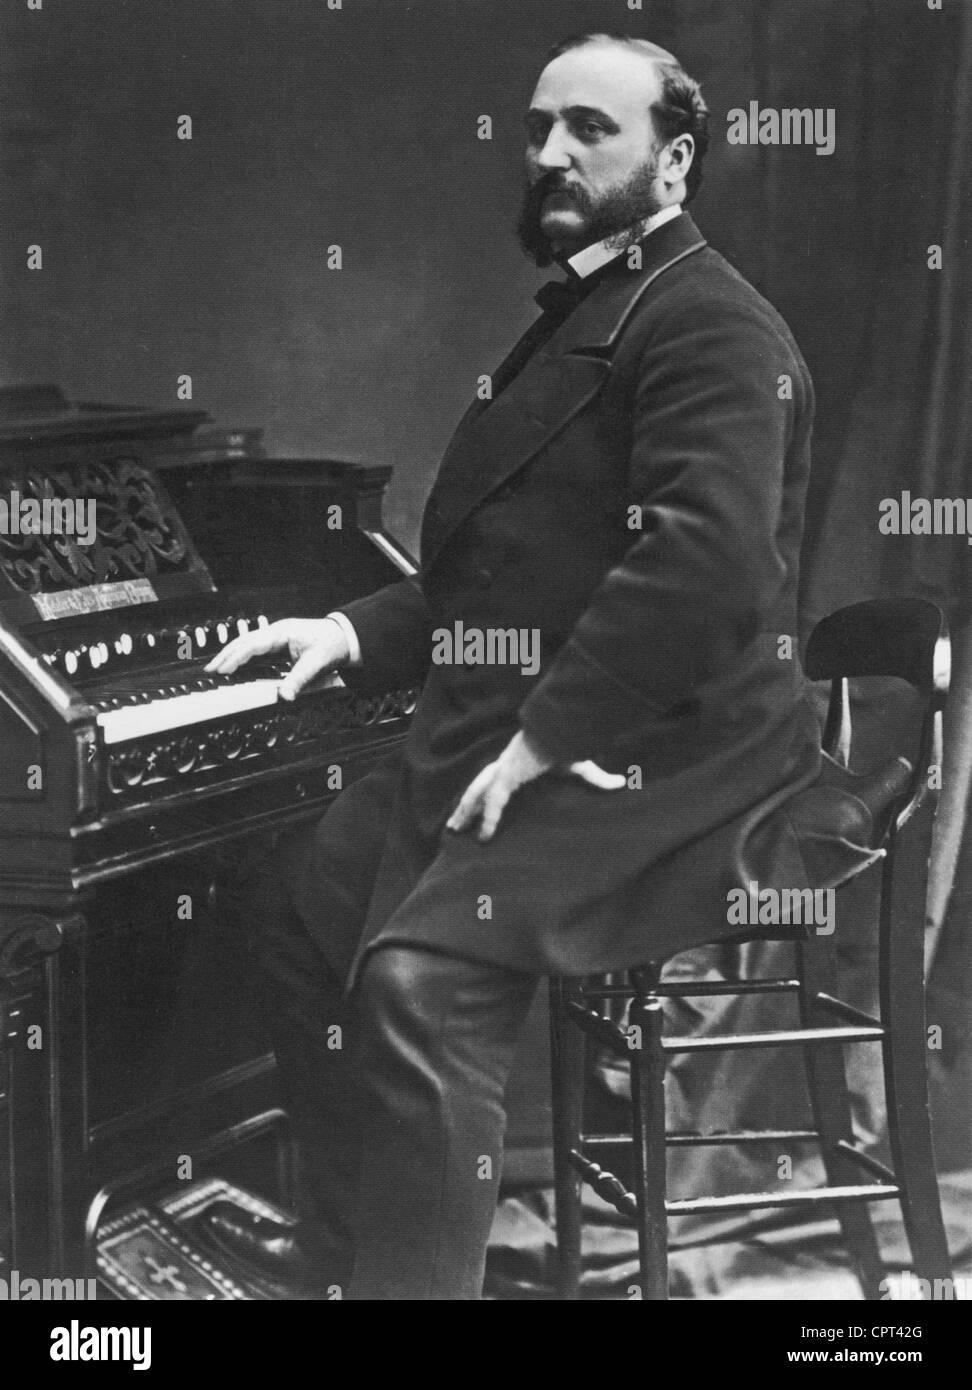 IRA SANKEY (1840-1908) US gospel singer and composer - Stock Image